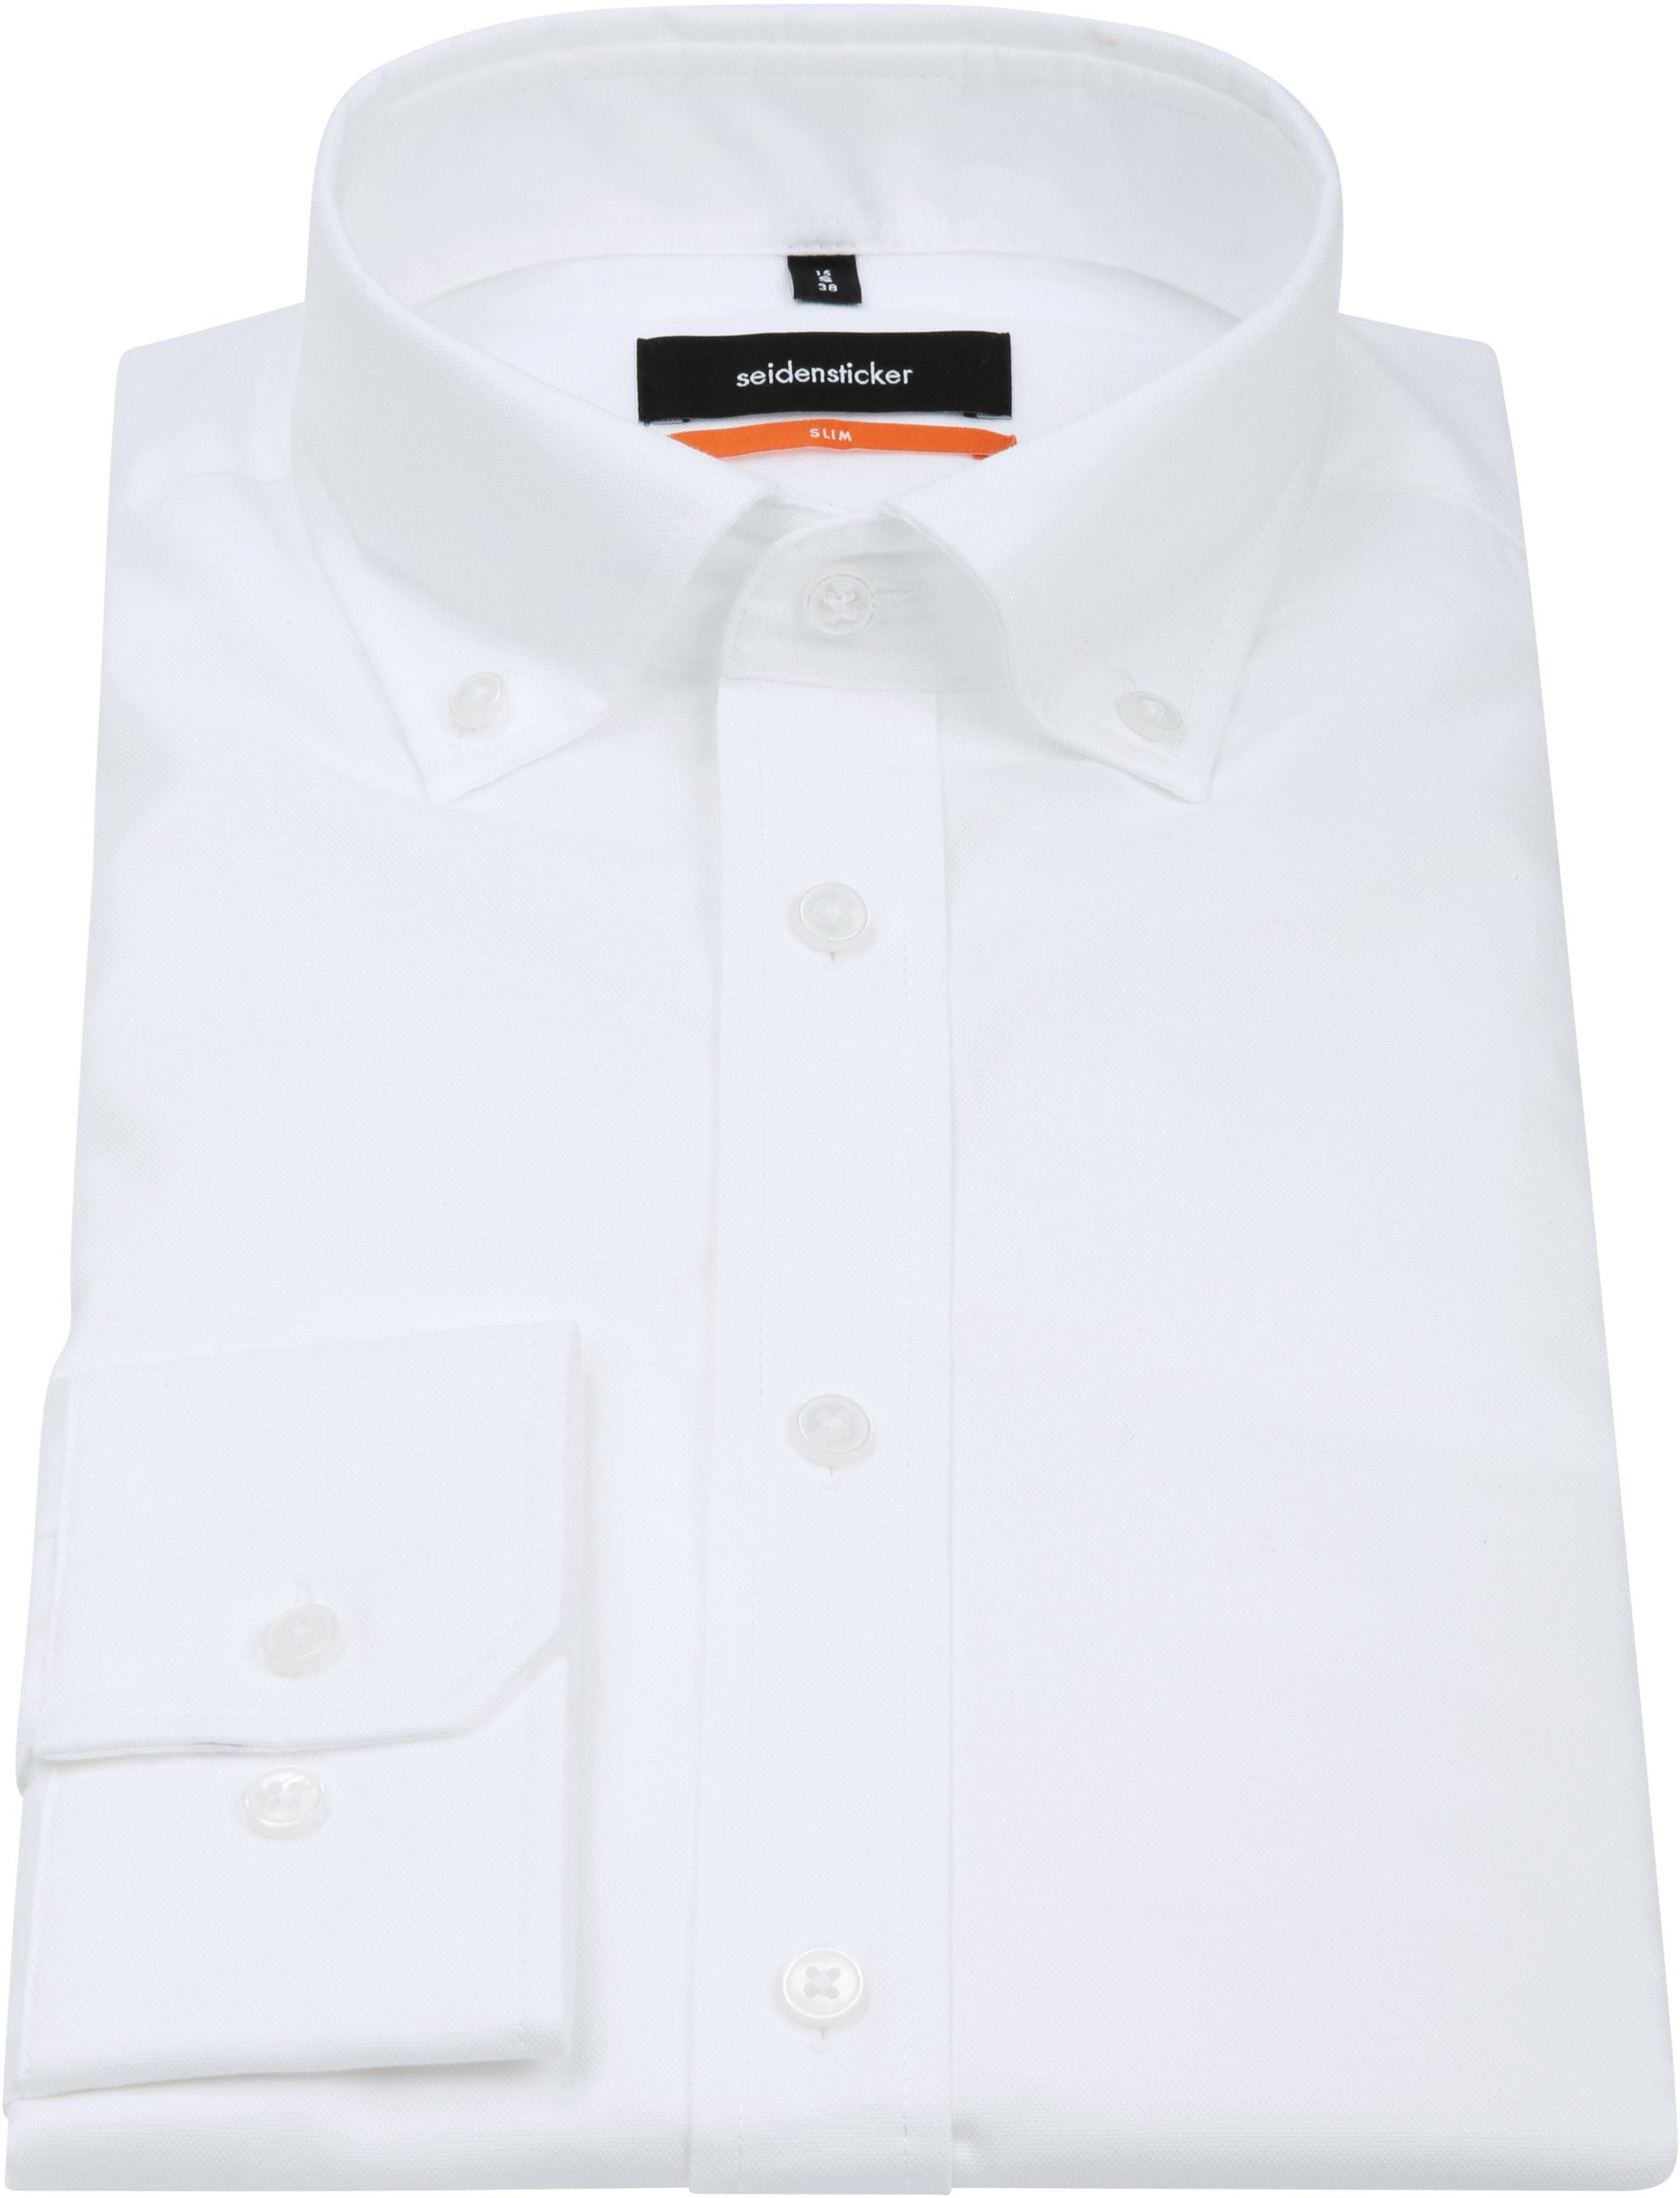 Seidensticker Shirt SF Button Down White foto 2